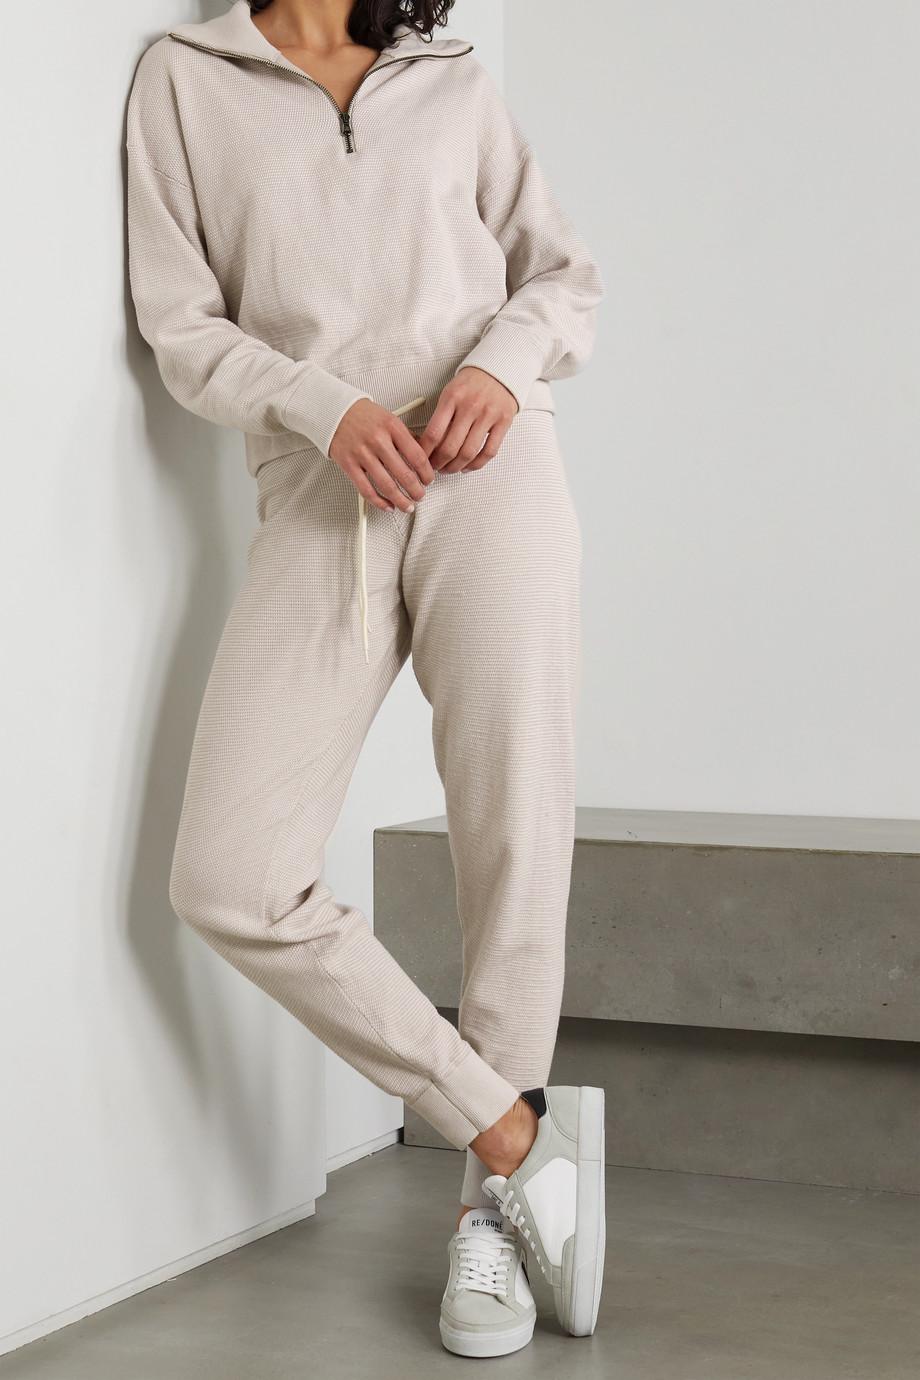 Varley Buckingham cotton sweatshirt